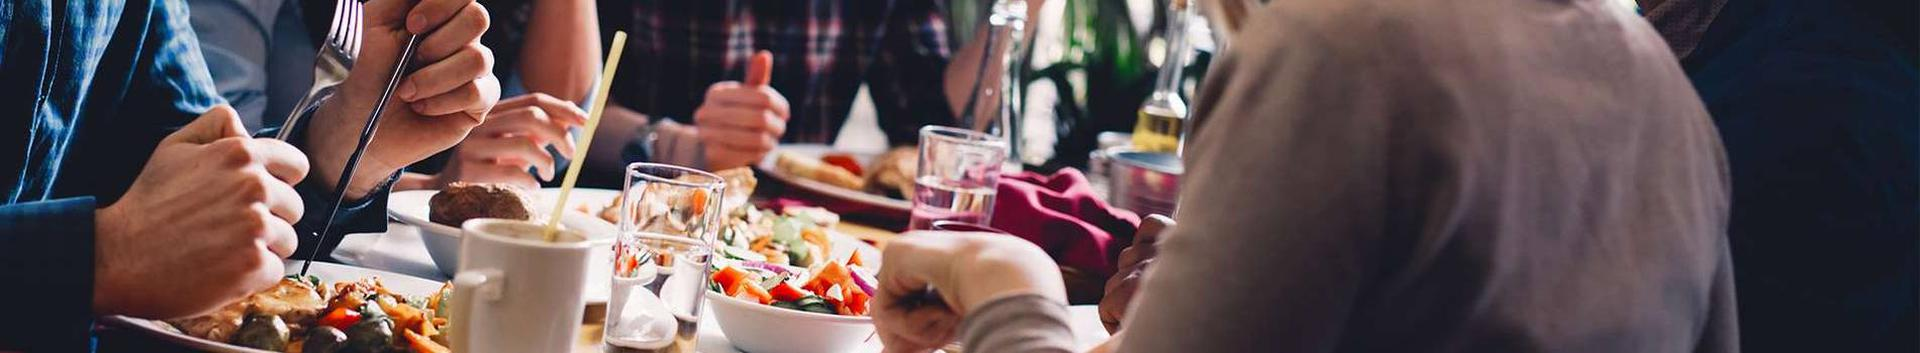 56101_toitlustus-restoran-jm-_34635450_xl.jpg